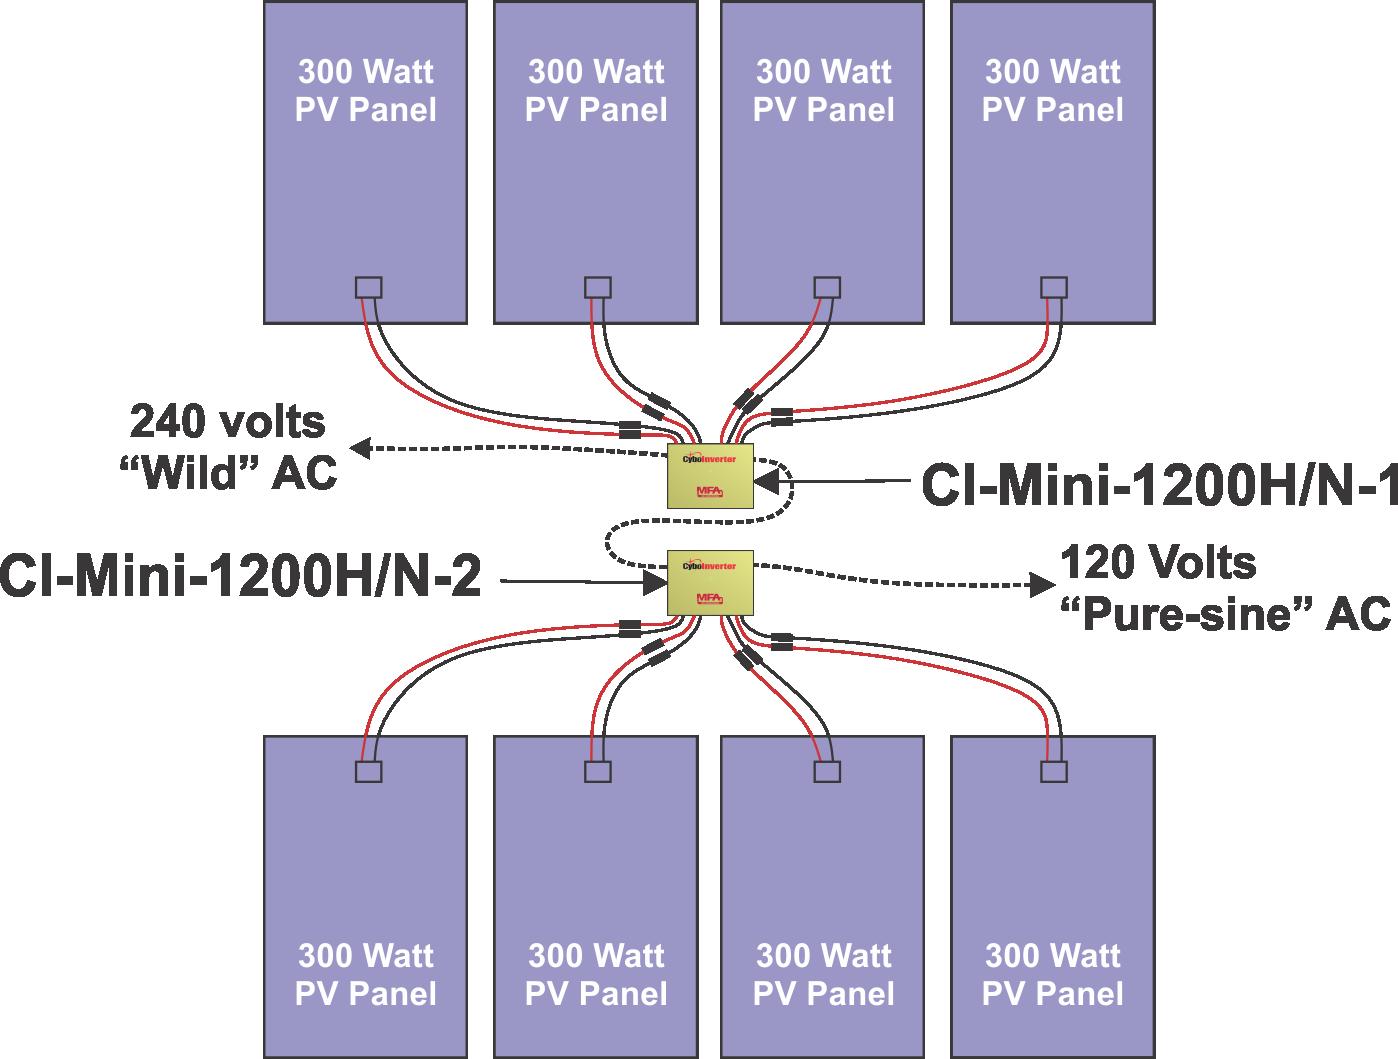 CyboInverter 120H/N Twin Pack